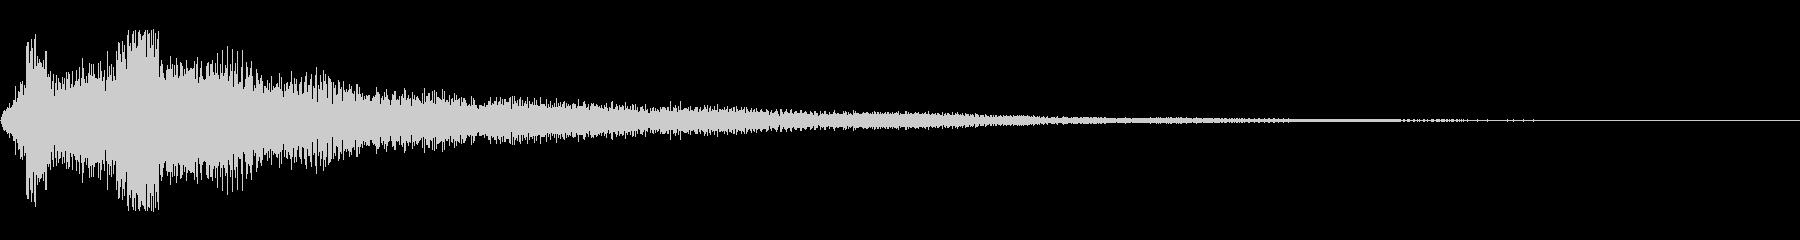 【GAME系】連鎖/パズル/2コンボの未再生の波形